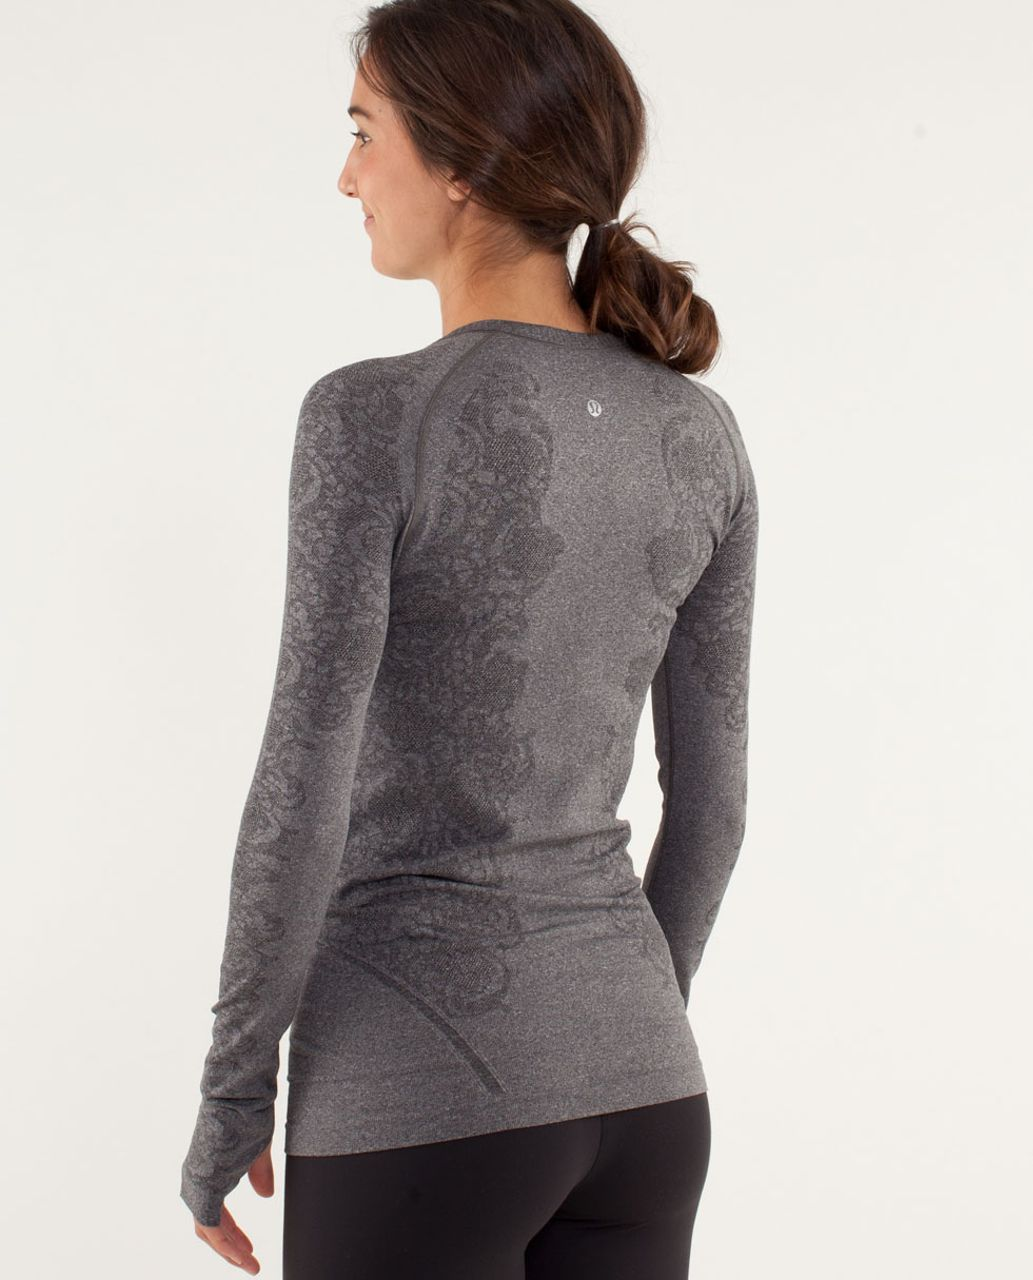 Lululemon Run:  Swiftly Tech Long Sleeve *Lace - Black